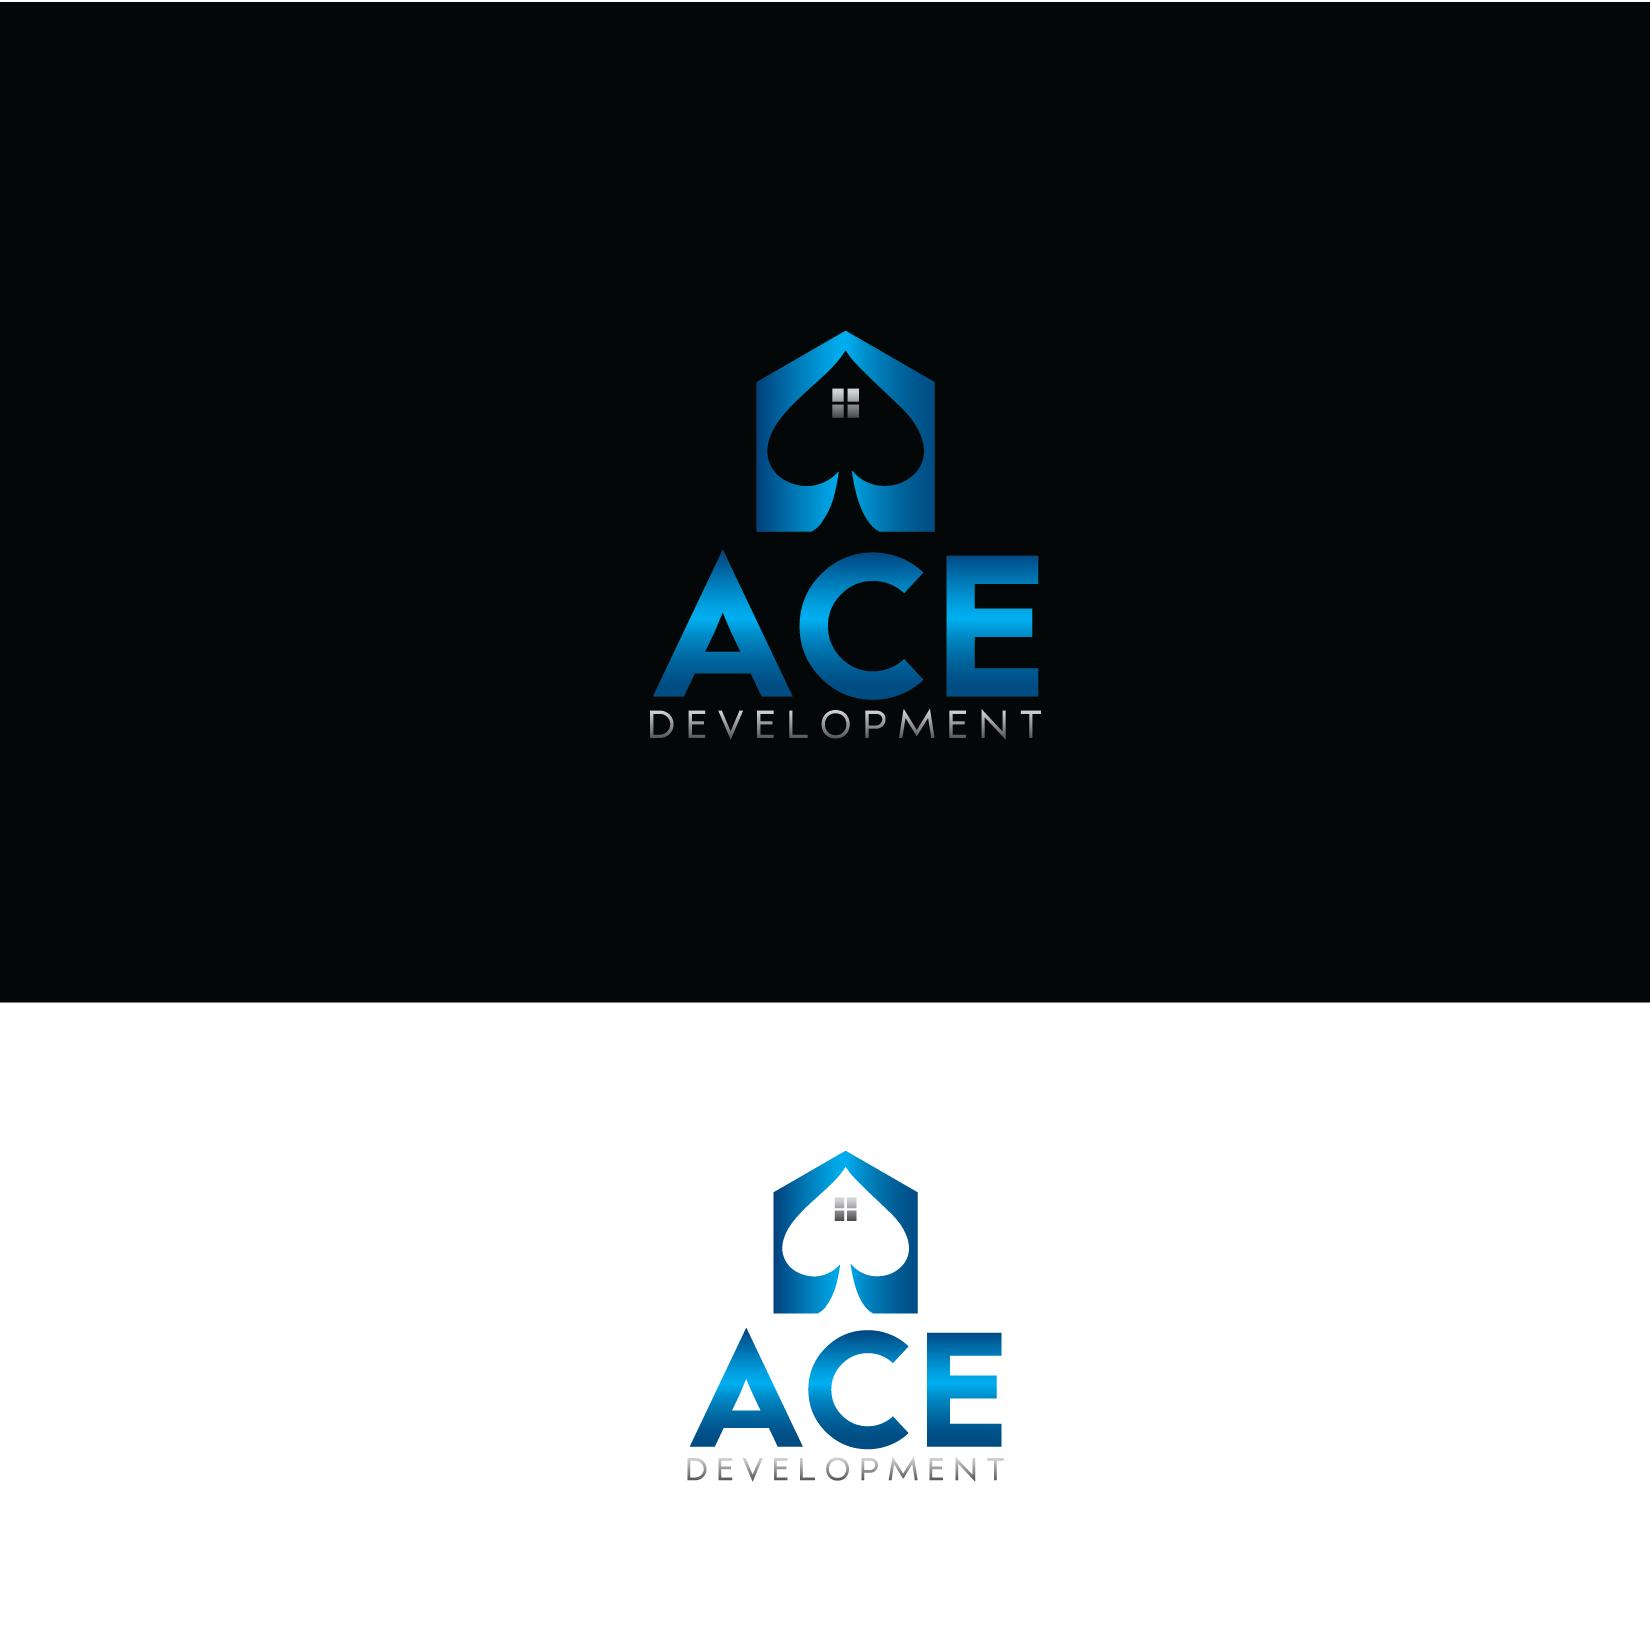 Logo Design by Private User - Entry No. 108 in the Logo Design Contest Fun Logo Design for Ace development.